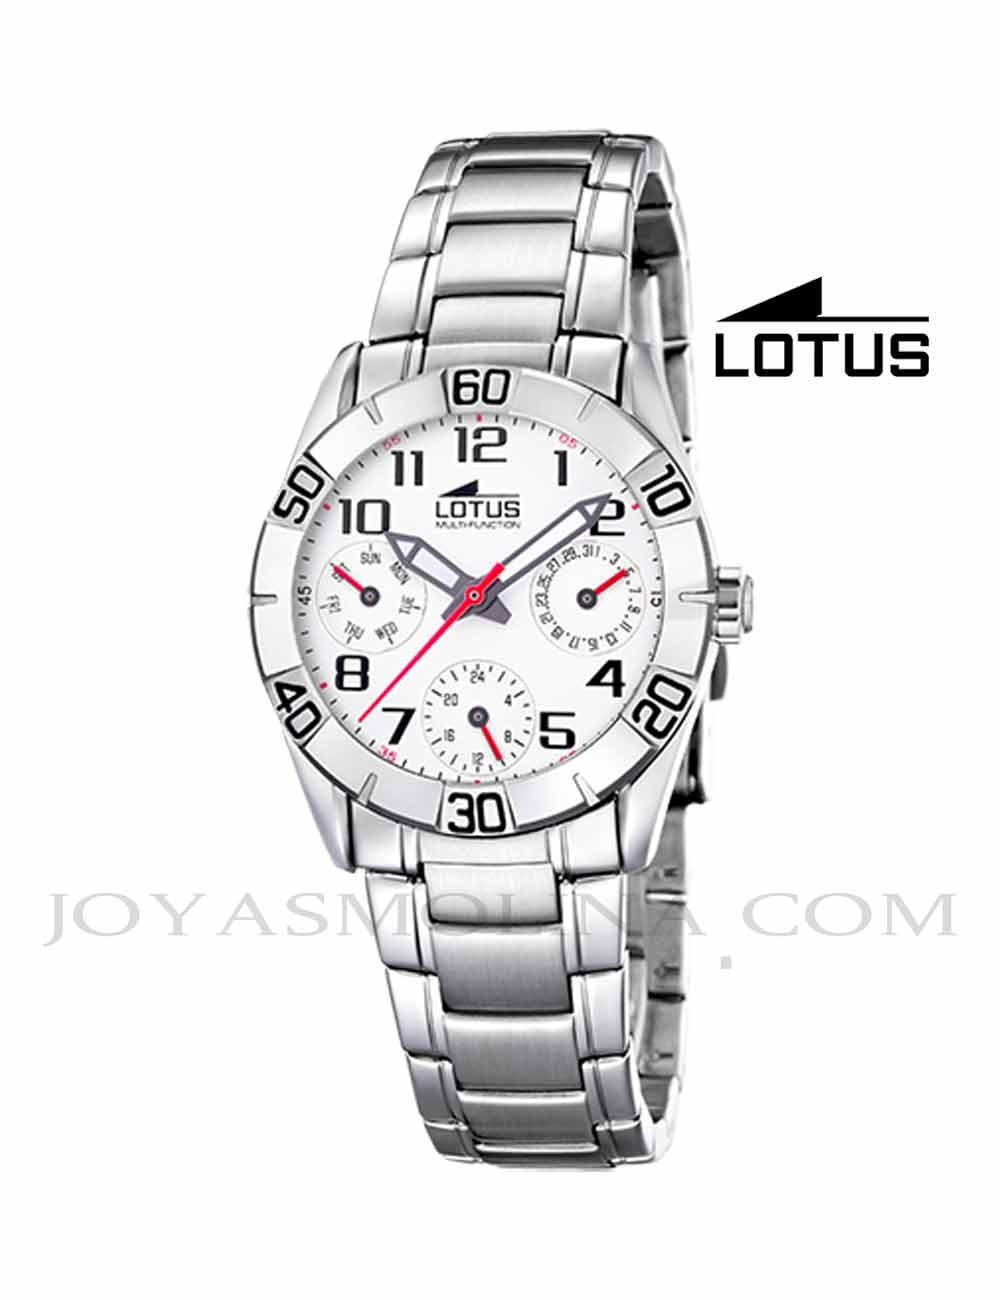 Reloj niño Lotus cadena esfera blanca multifunciones redondo